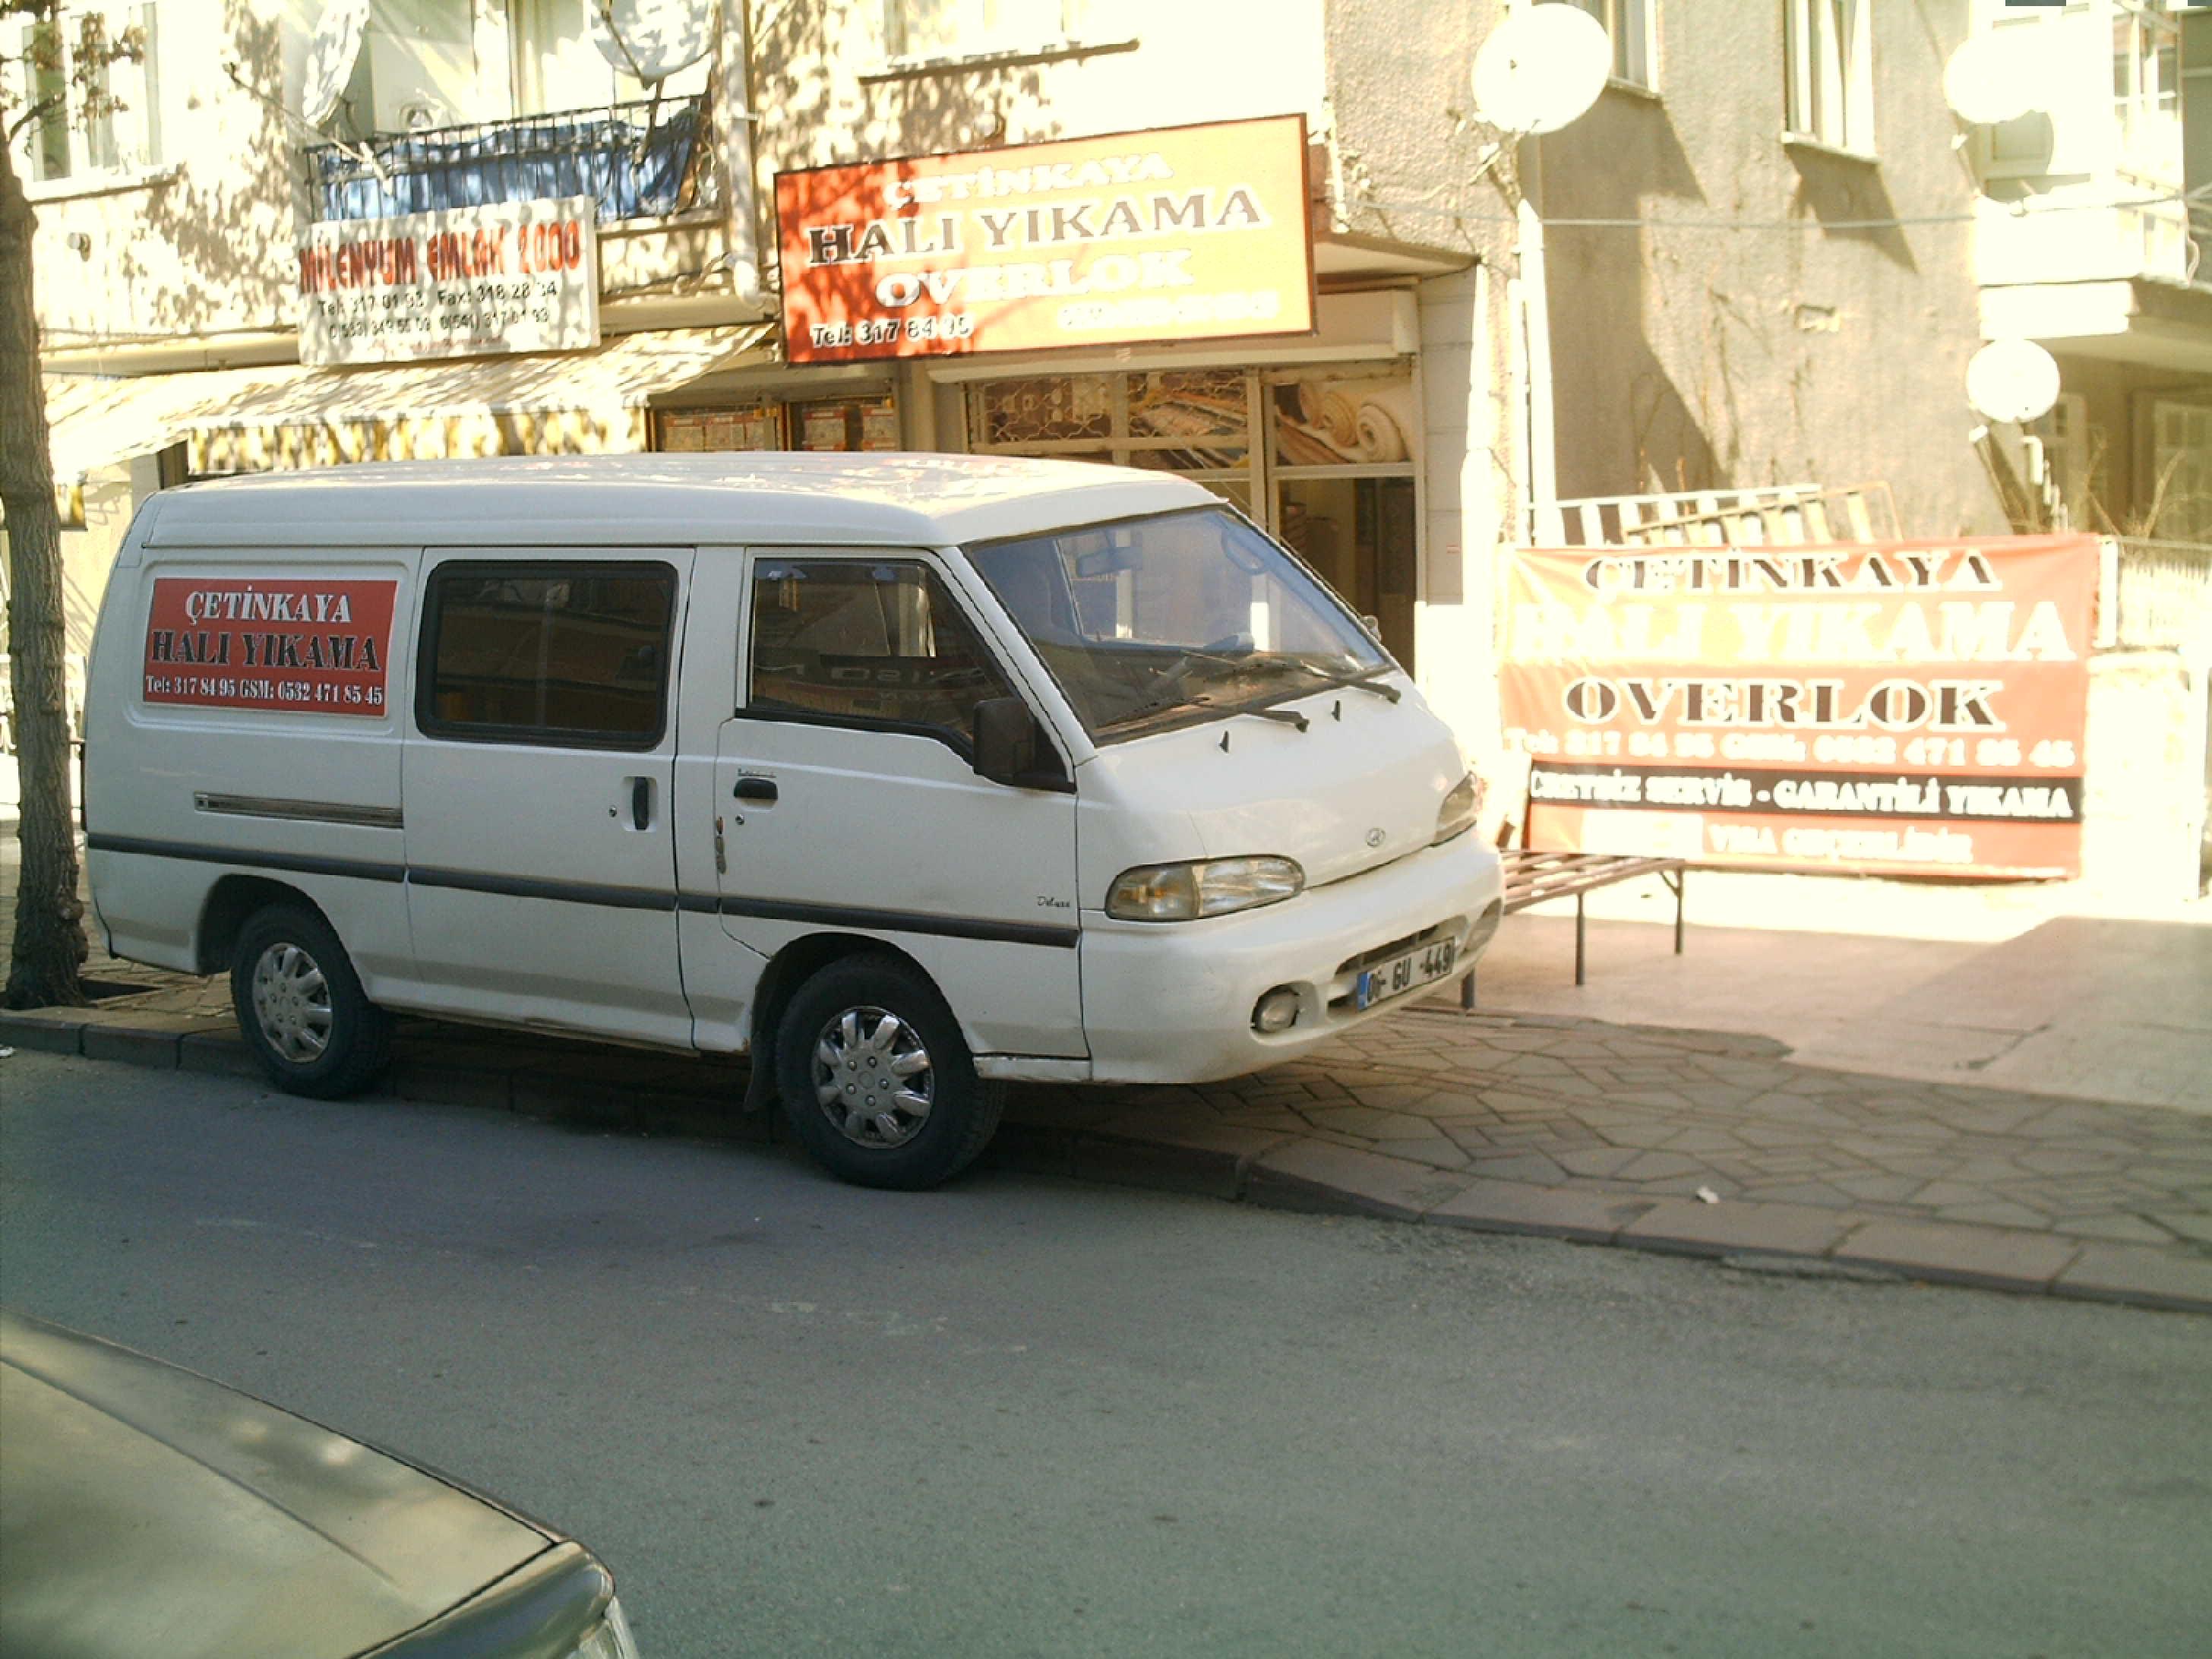 bostancik_hali_yikama_servis-1